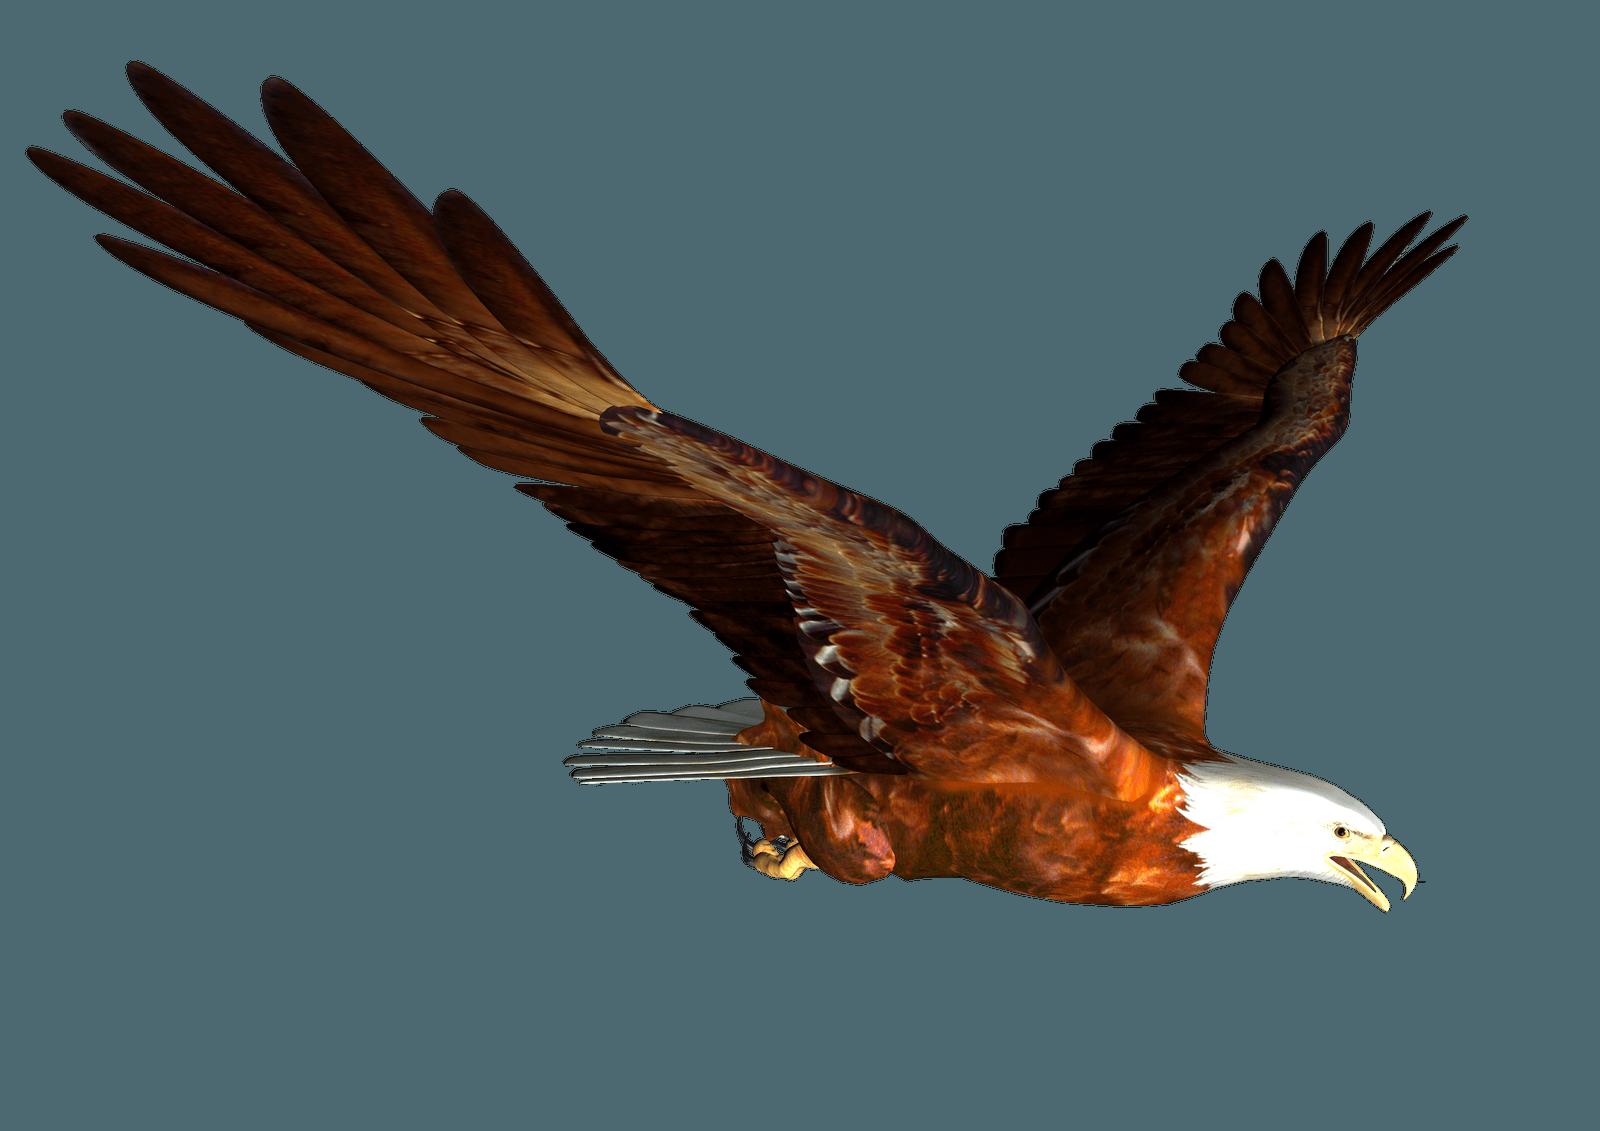 Animated Bald Eagle Flying Png Image Clip Art Pictures Cartoon Clip Art Bald Eagle